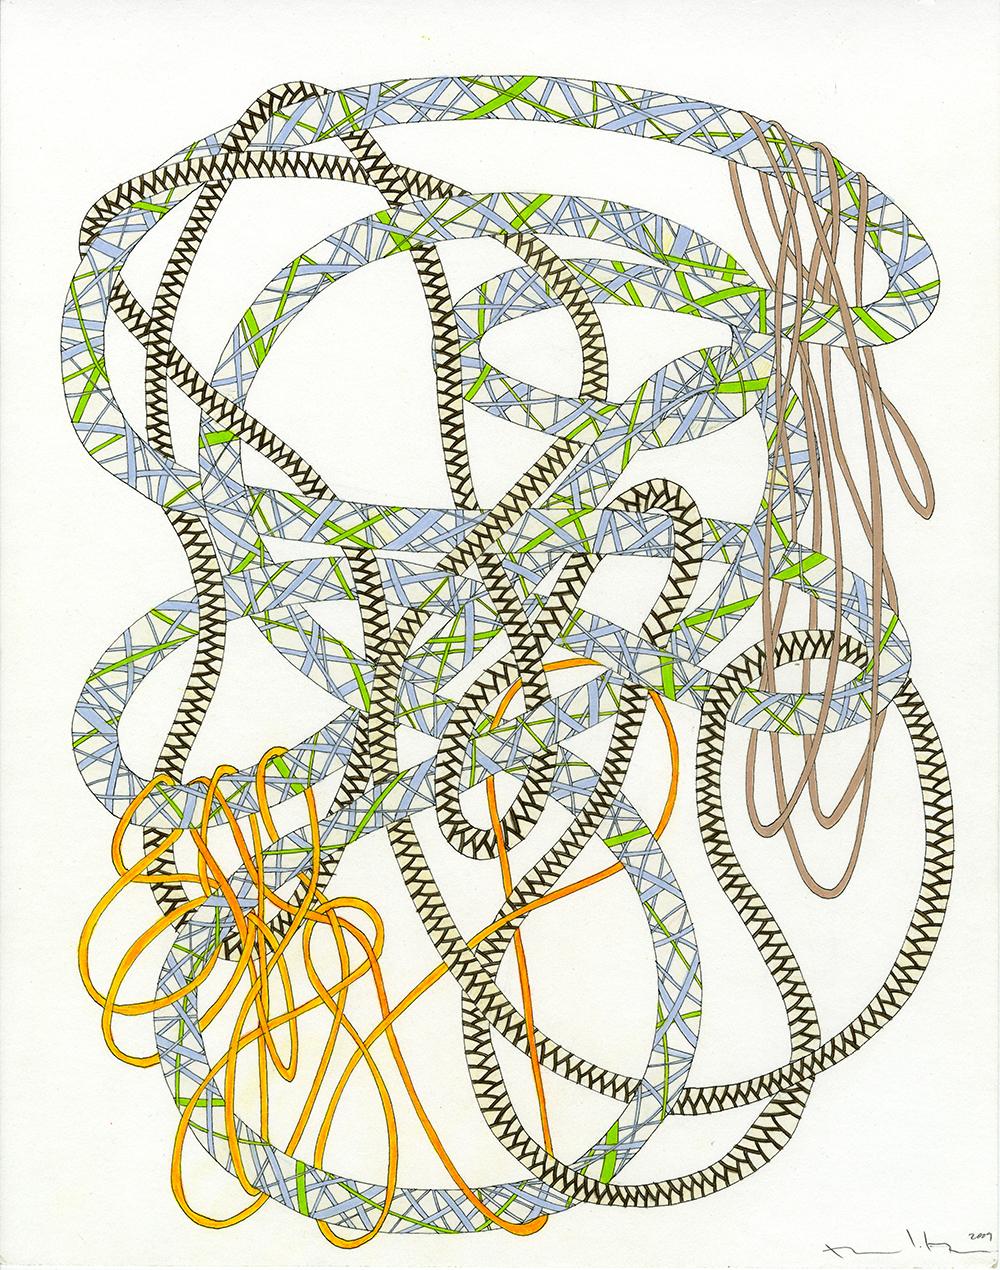 Ropes in Blue, Green, Tan, & Orange_11x14_2009_CC.jpg